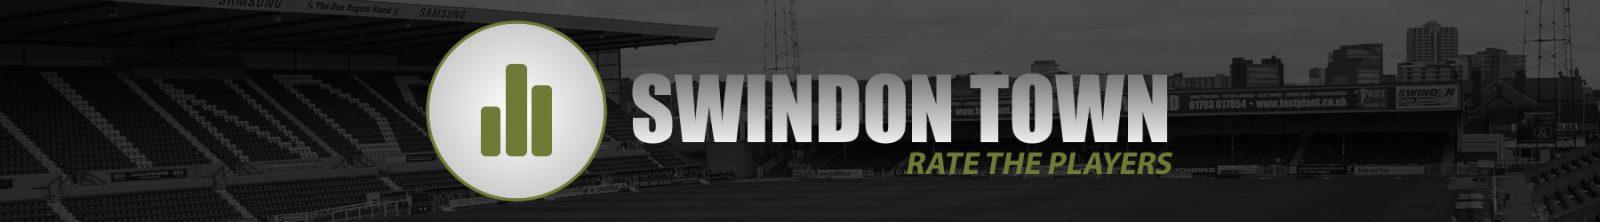 Rate Swindon Town